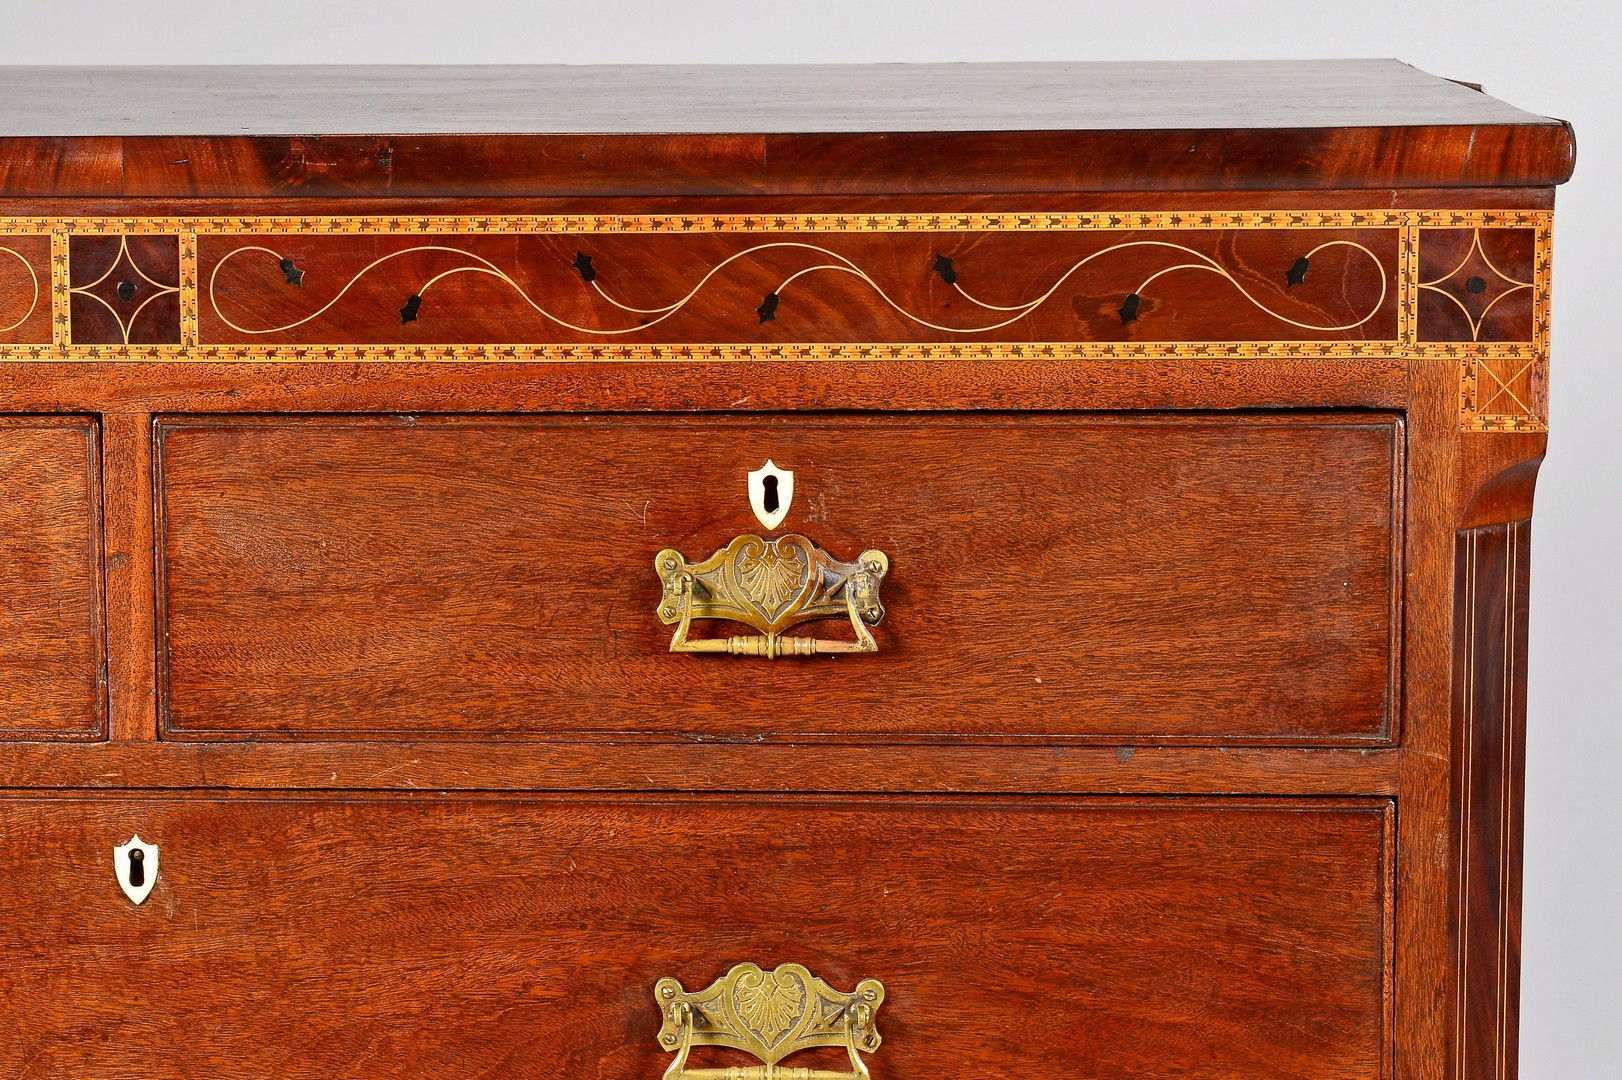 Lot 314: Neoclassical Inlaid Chest or Bureau